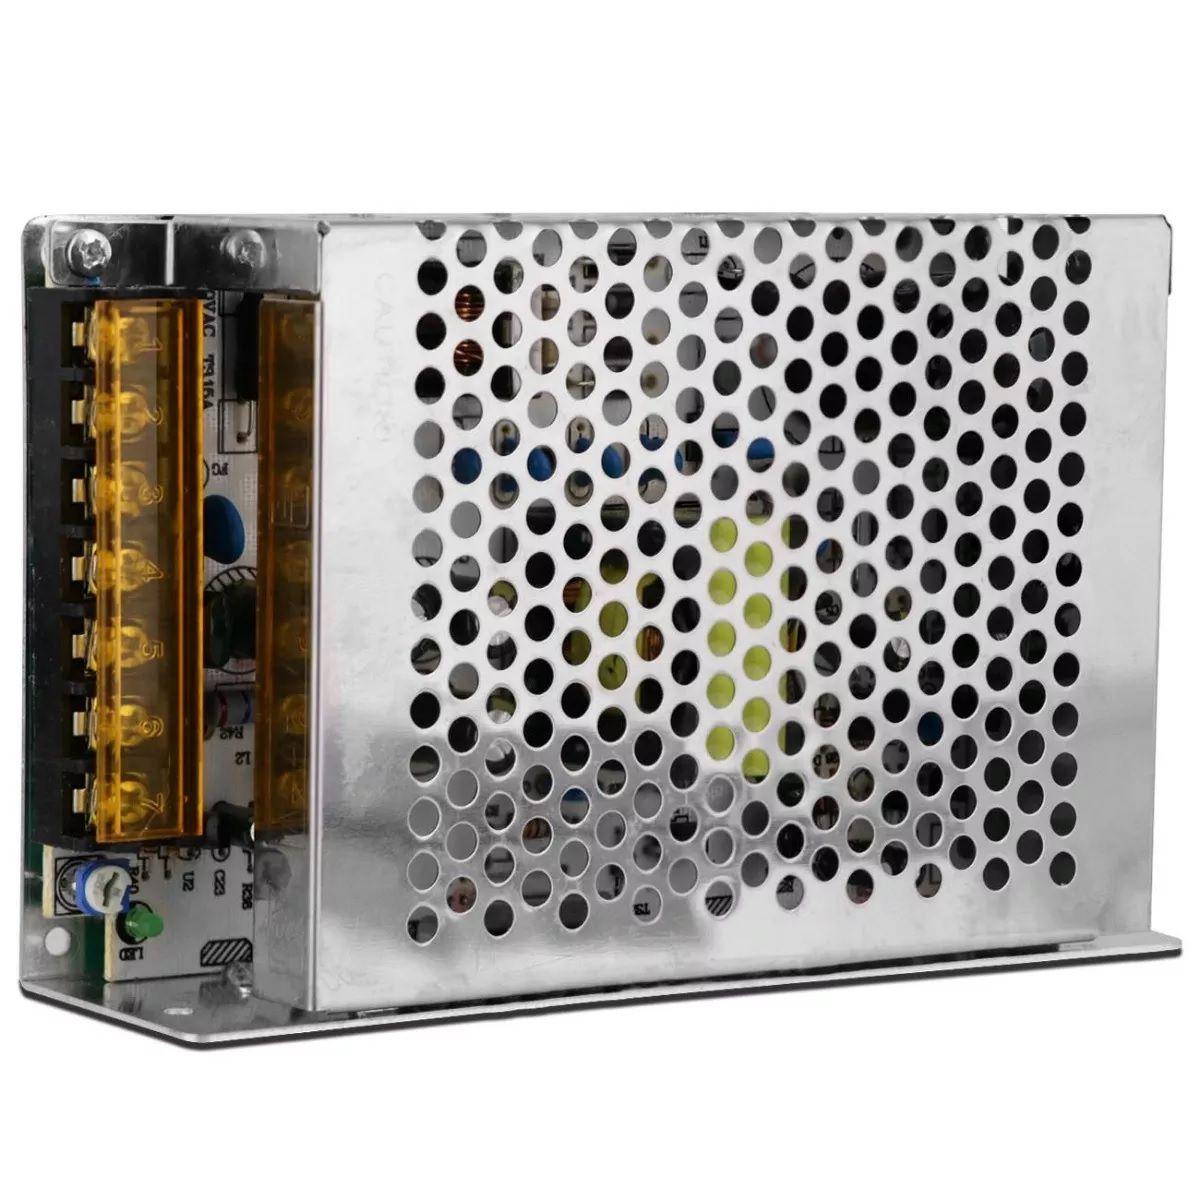 FONTE COLMEIA 12V / 10A  - TECTECH BRASIL COMPUTERS